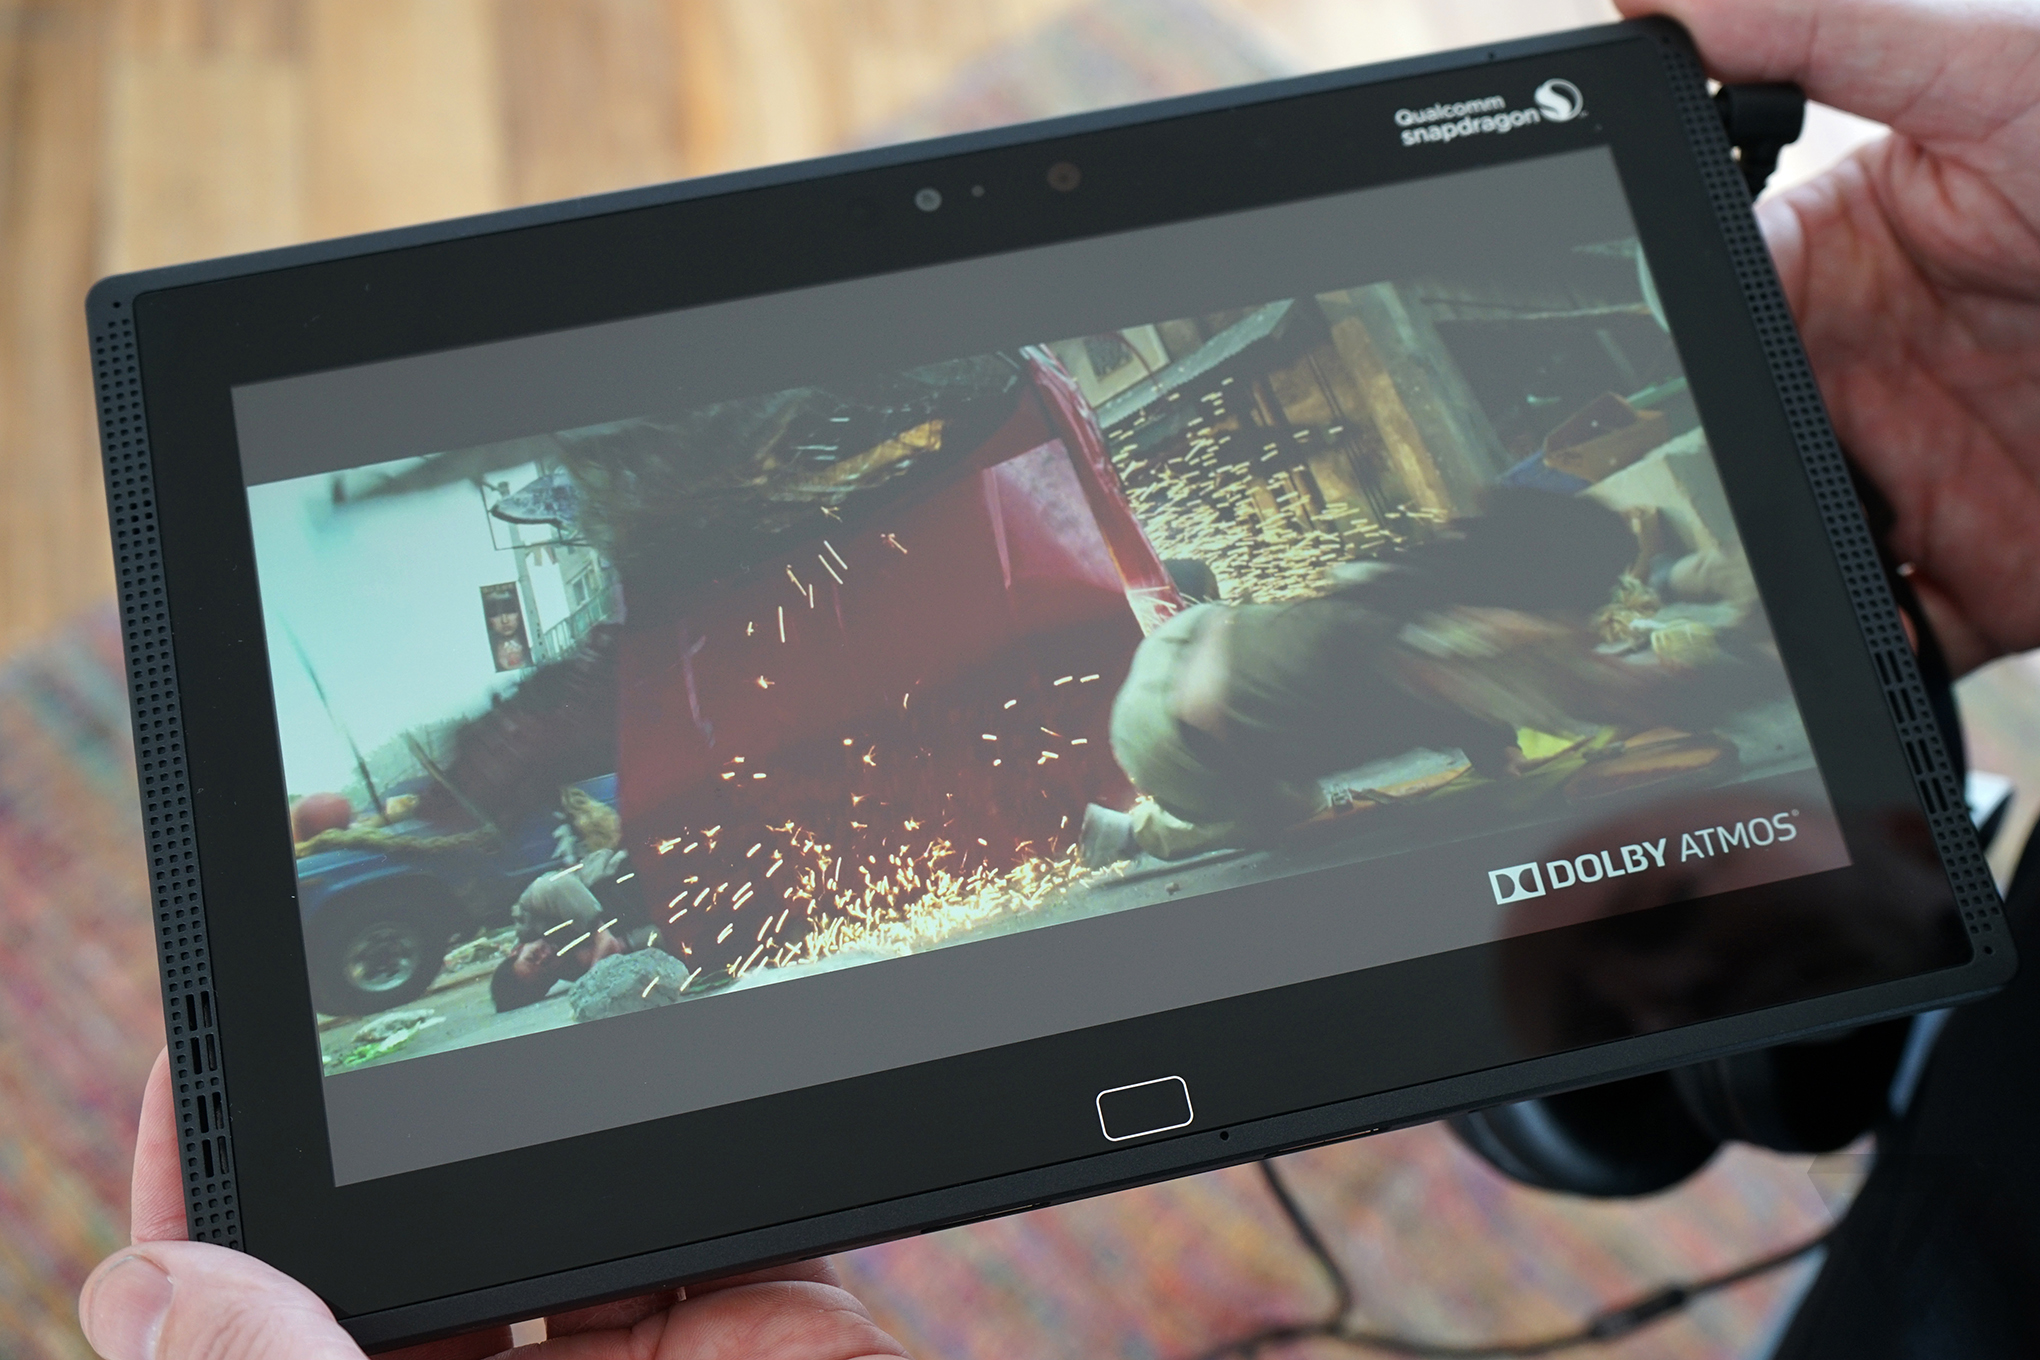 Qualcomm's Snapdragon 810 demo tablet